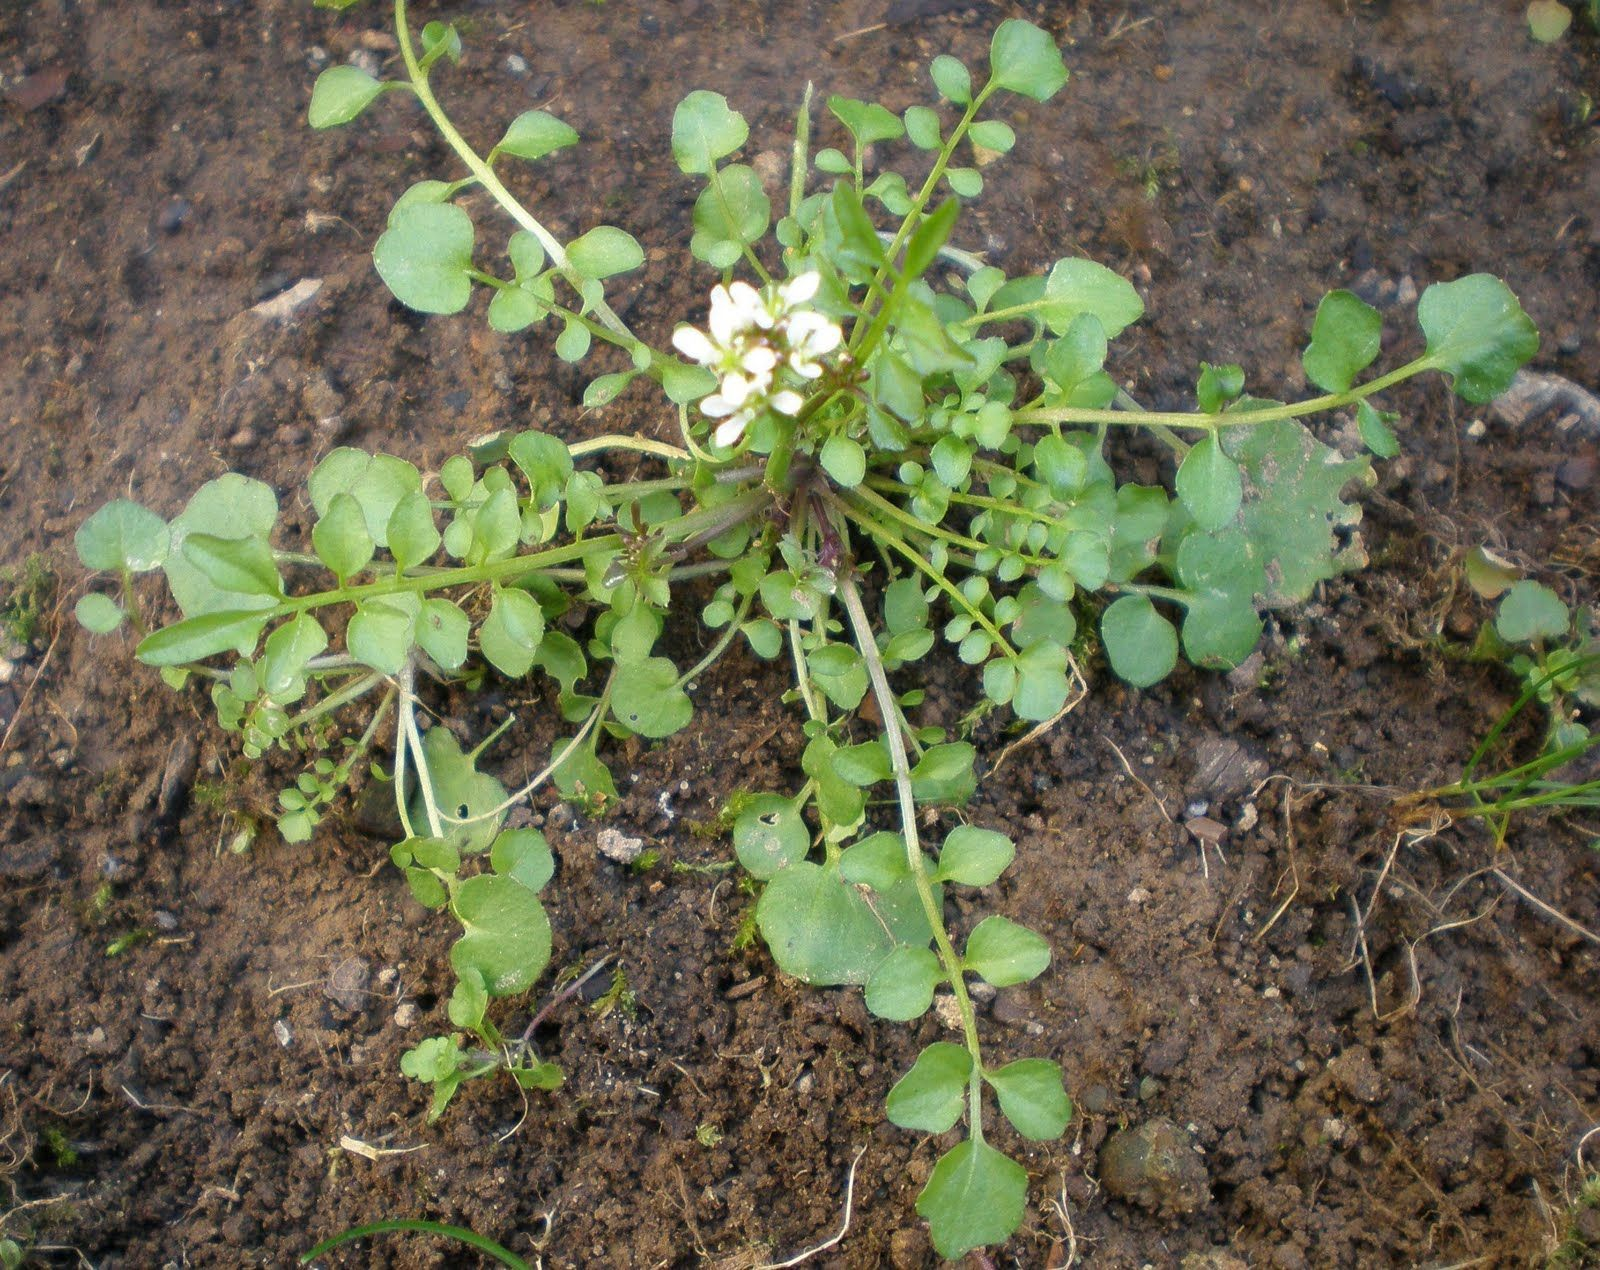 Weeds in flower beds identify - Gardens